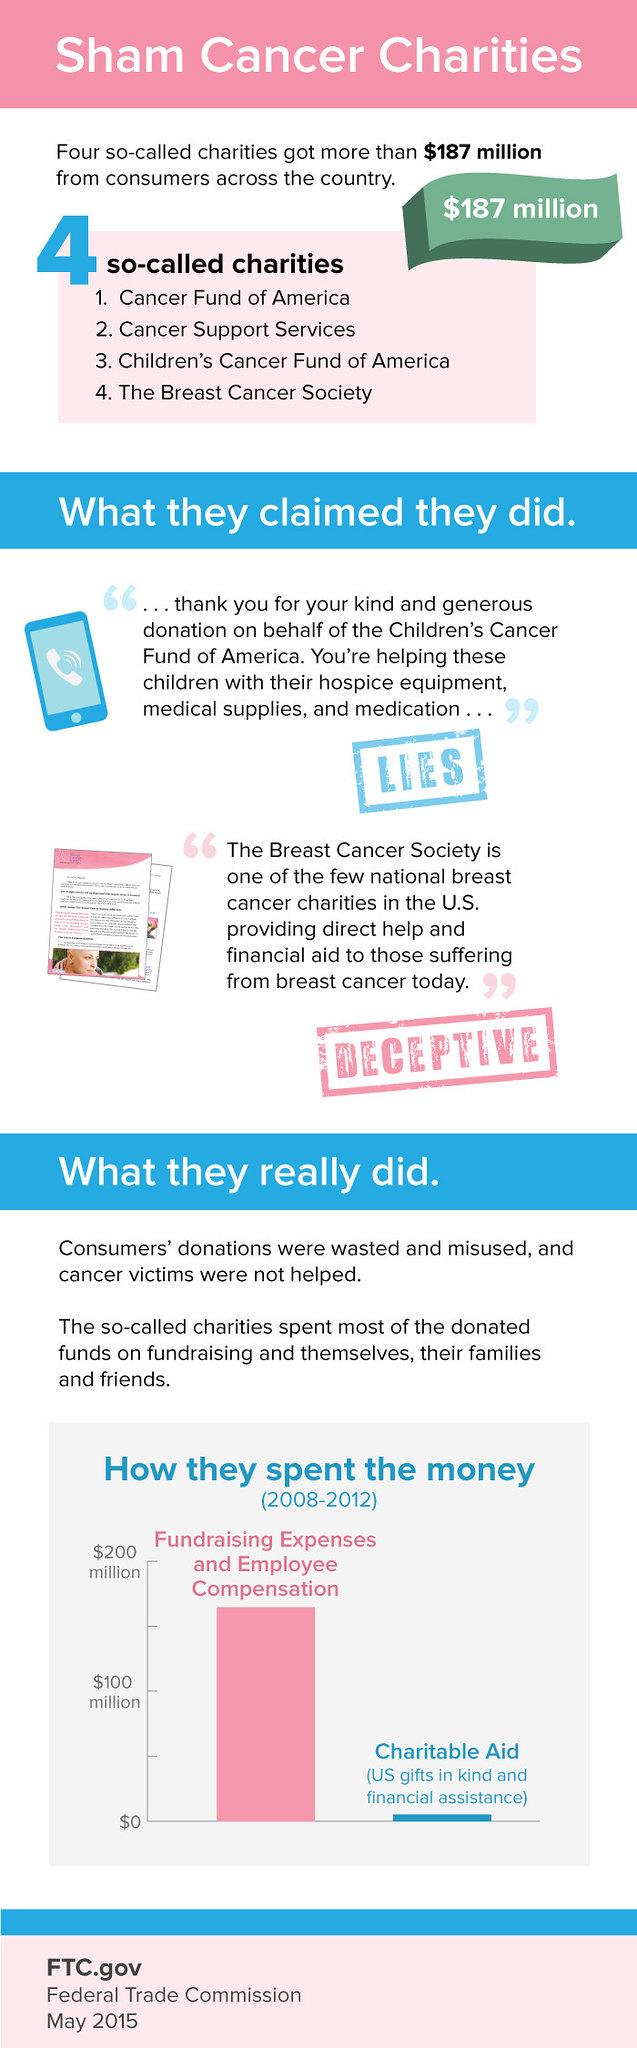 sham-cancer-charities